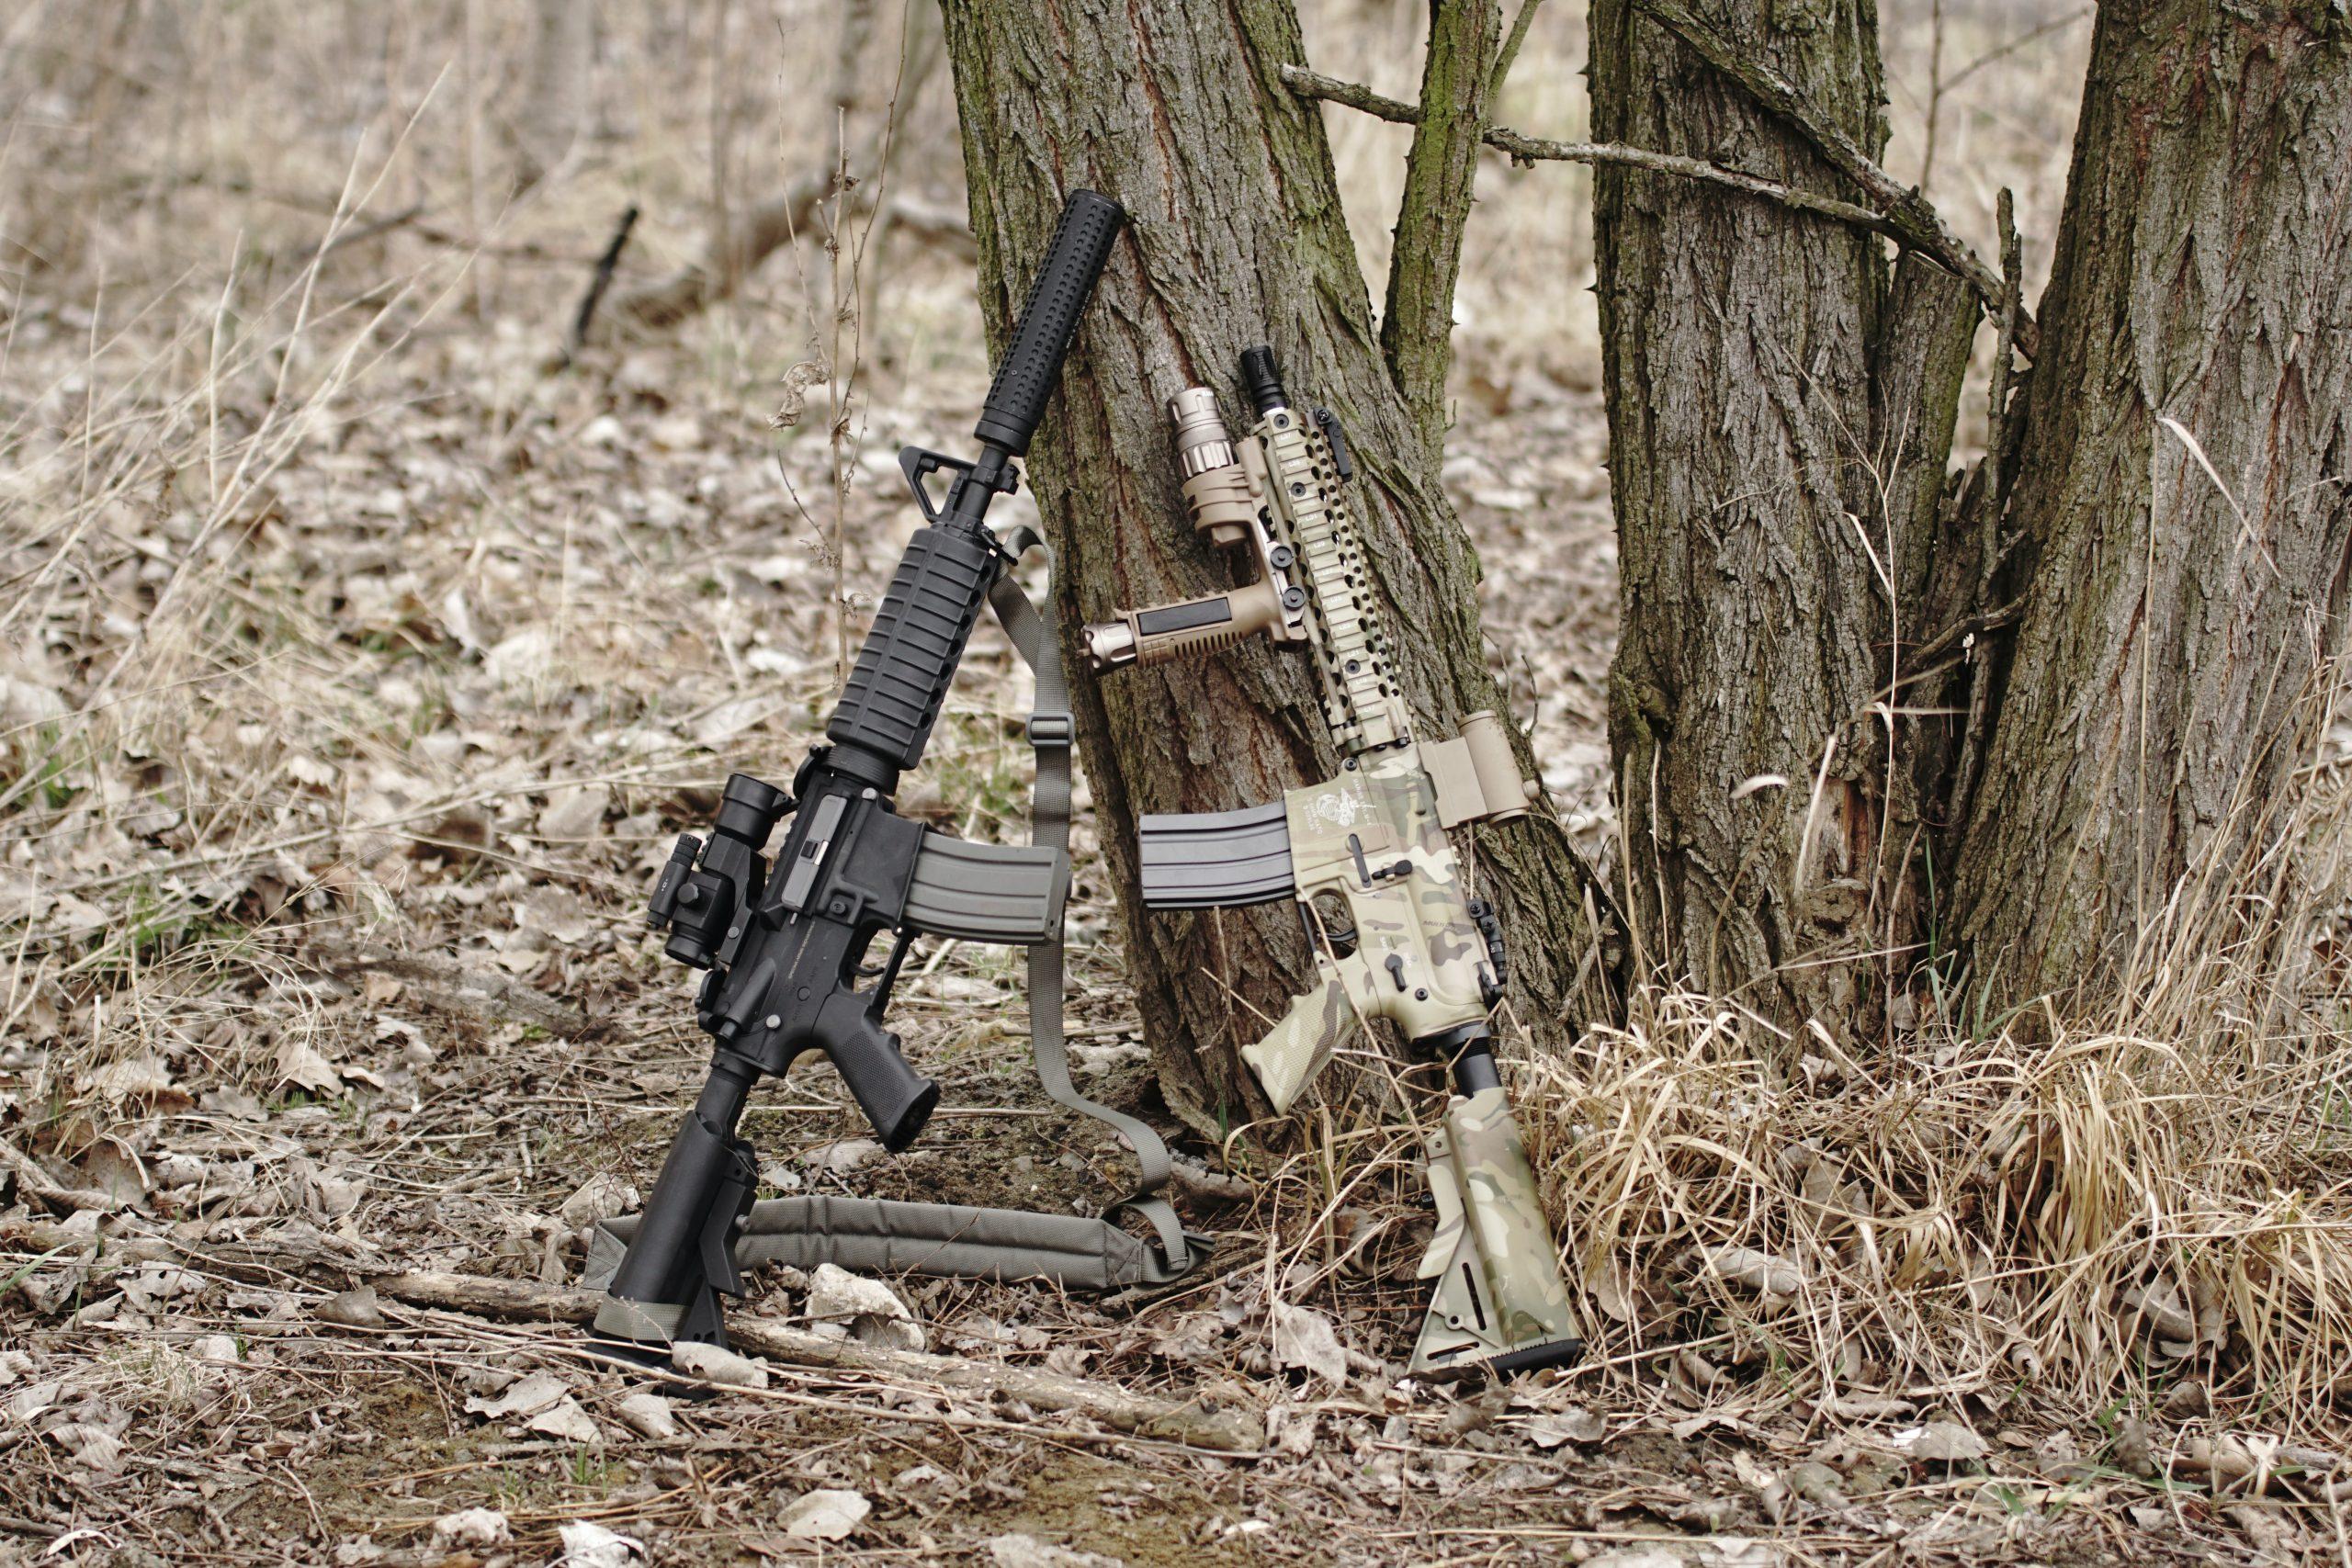 rifle, rifle's performance